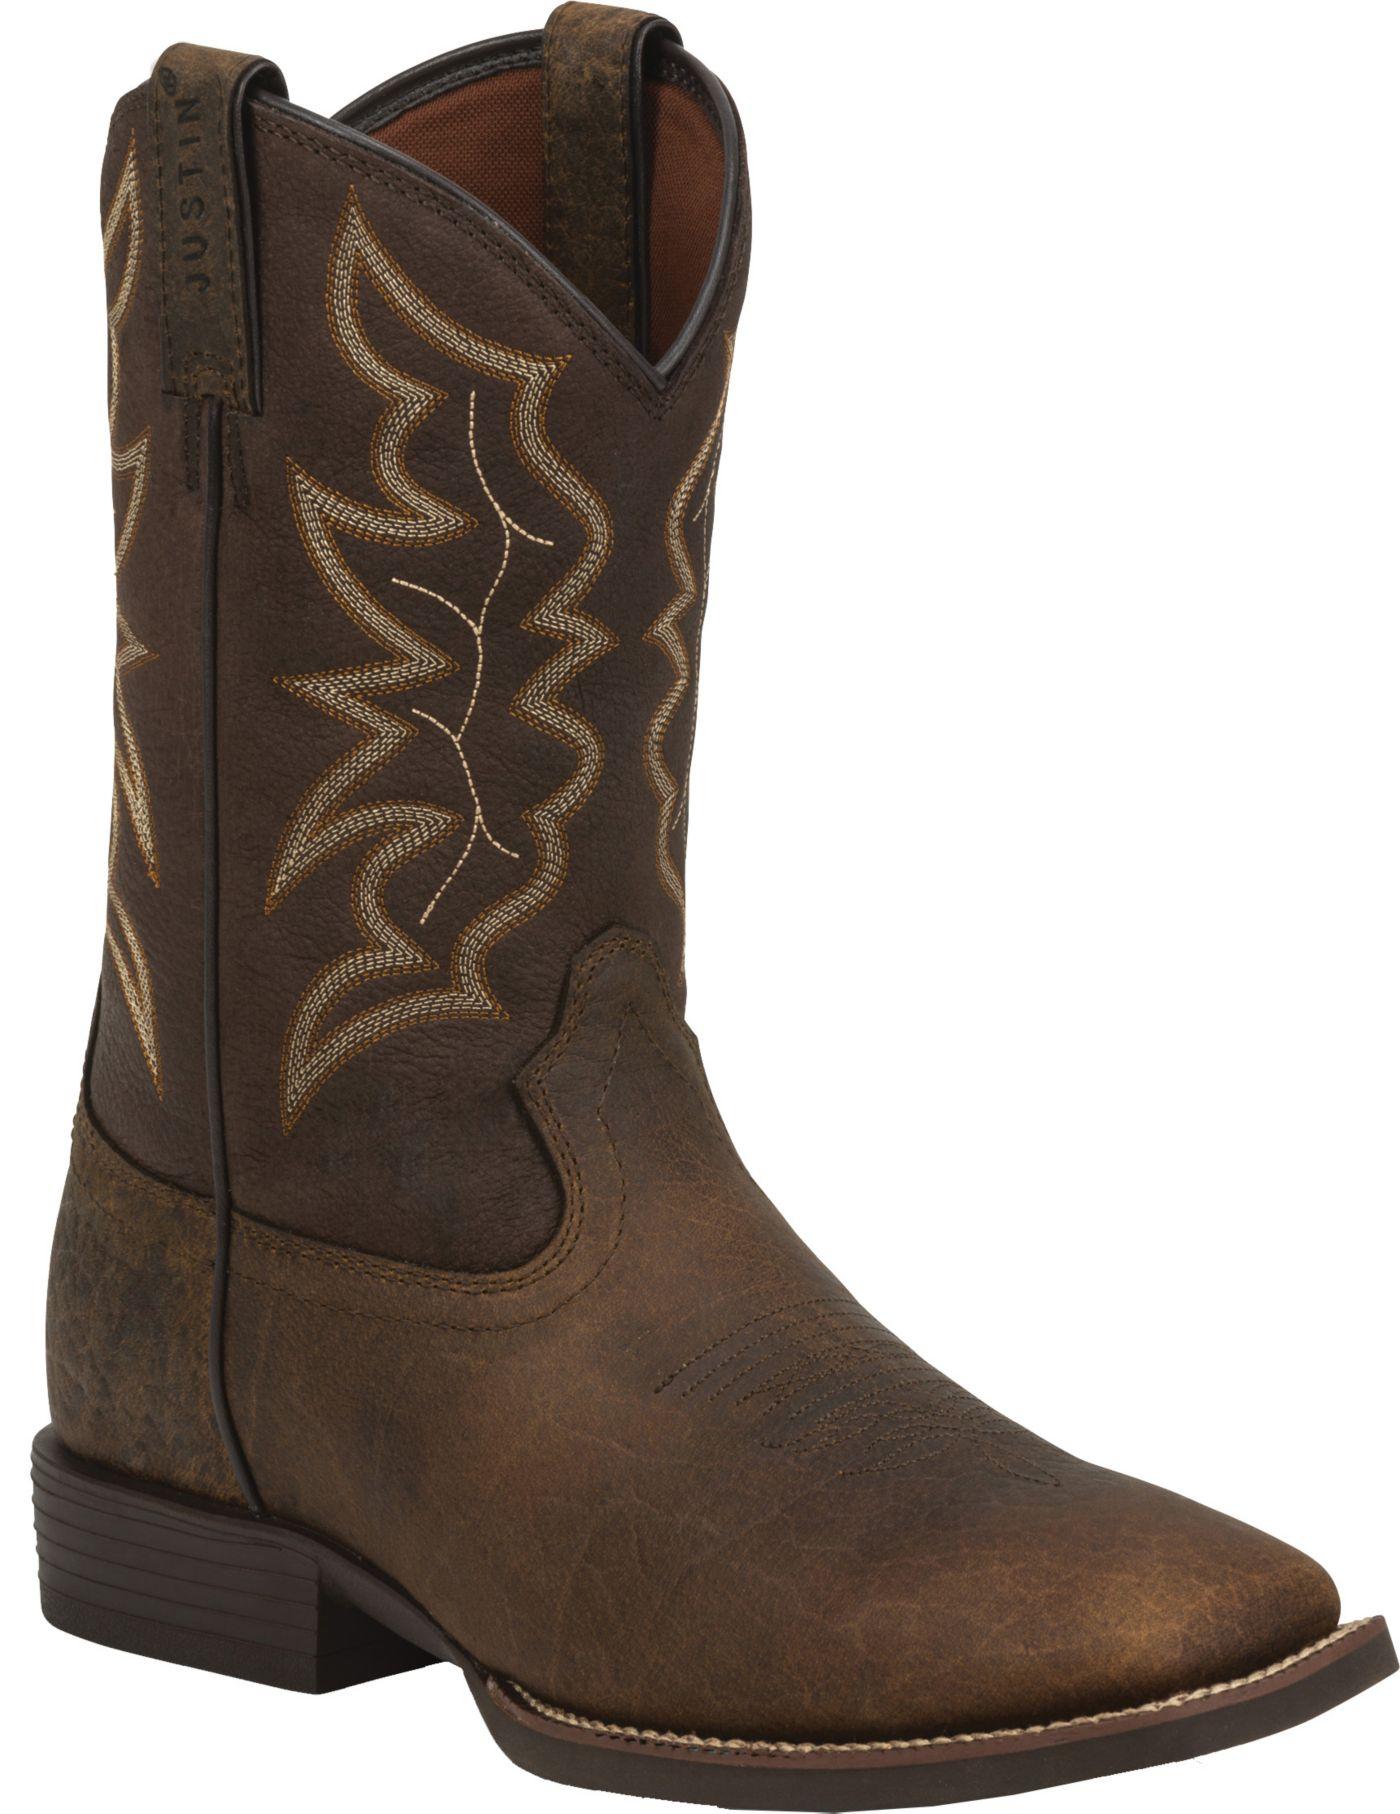 Justin Men's Chet Western Boots